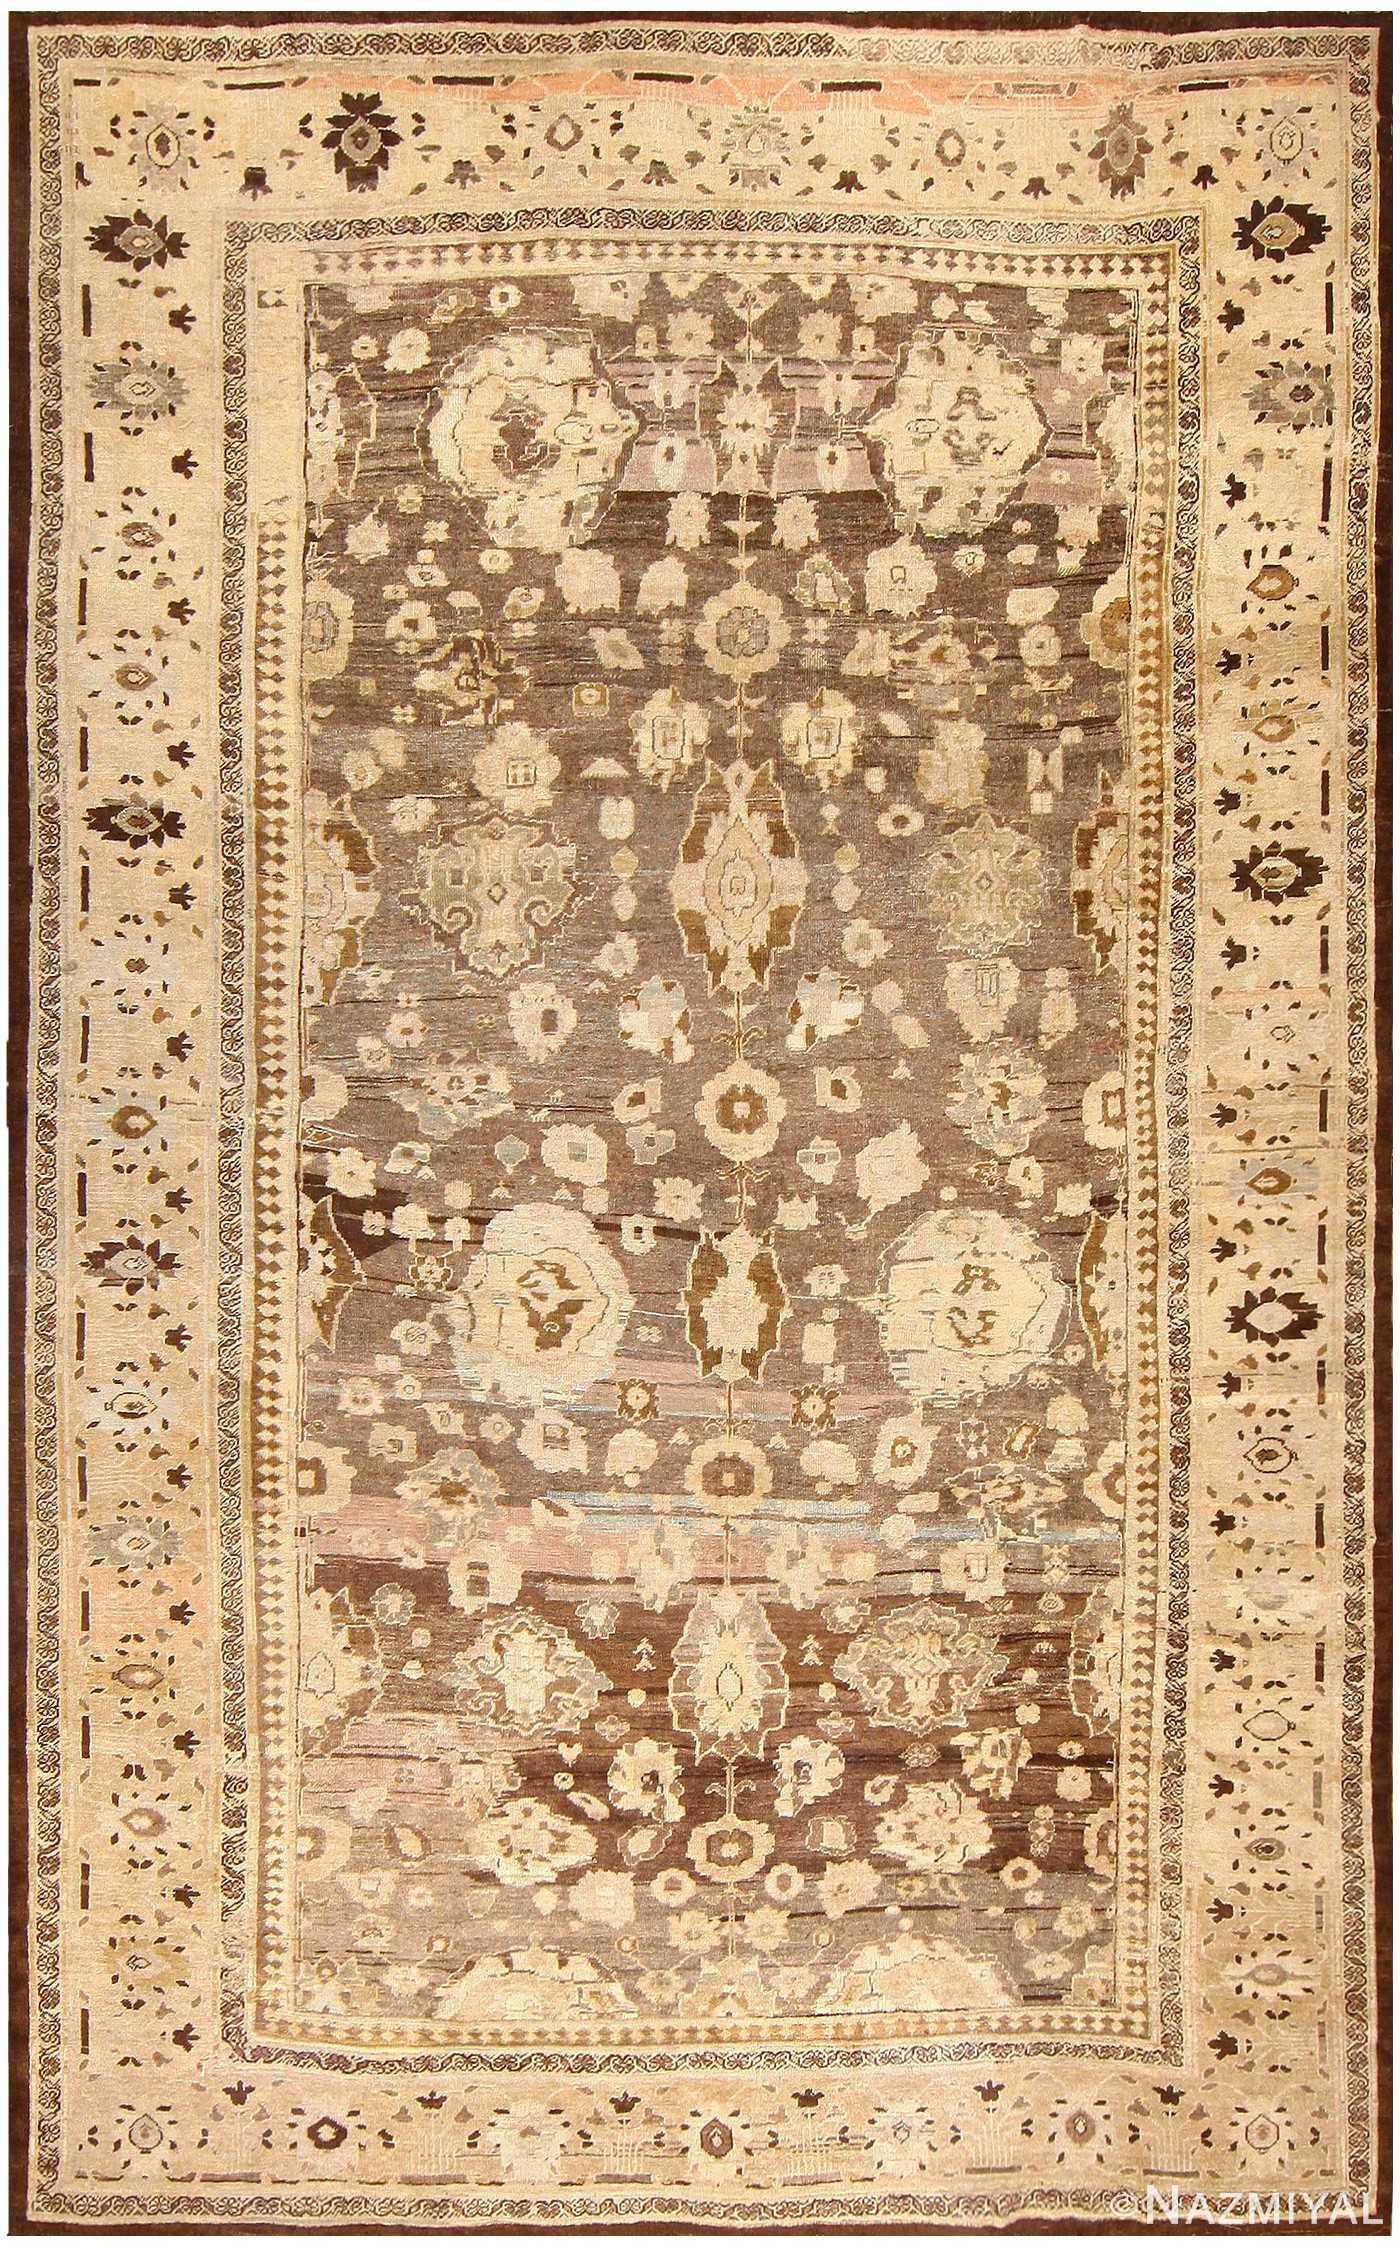 Antique Persian Sultanabad Rug 47464 by Nazmiyal